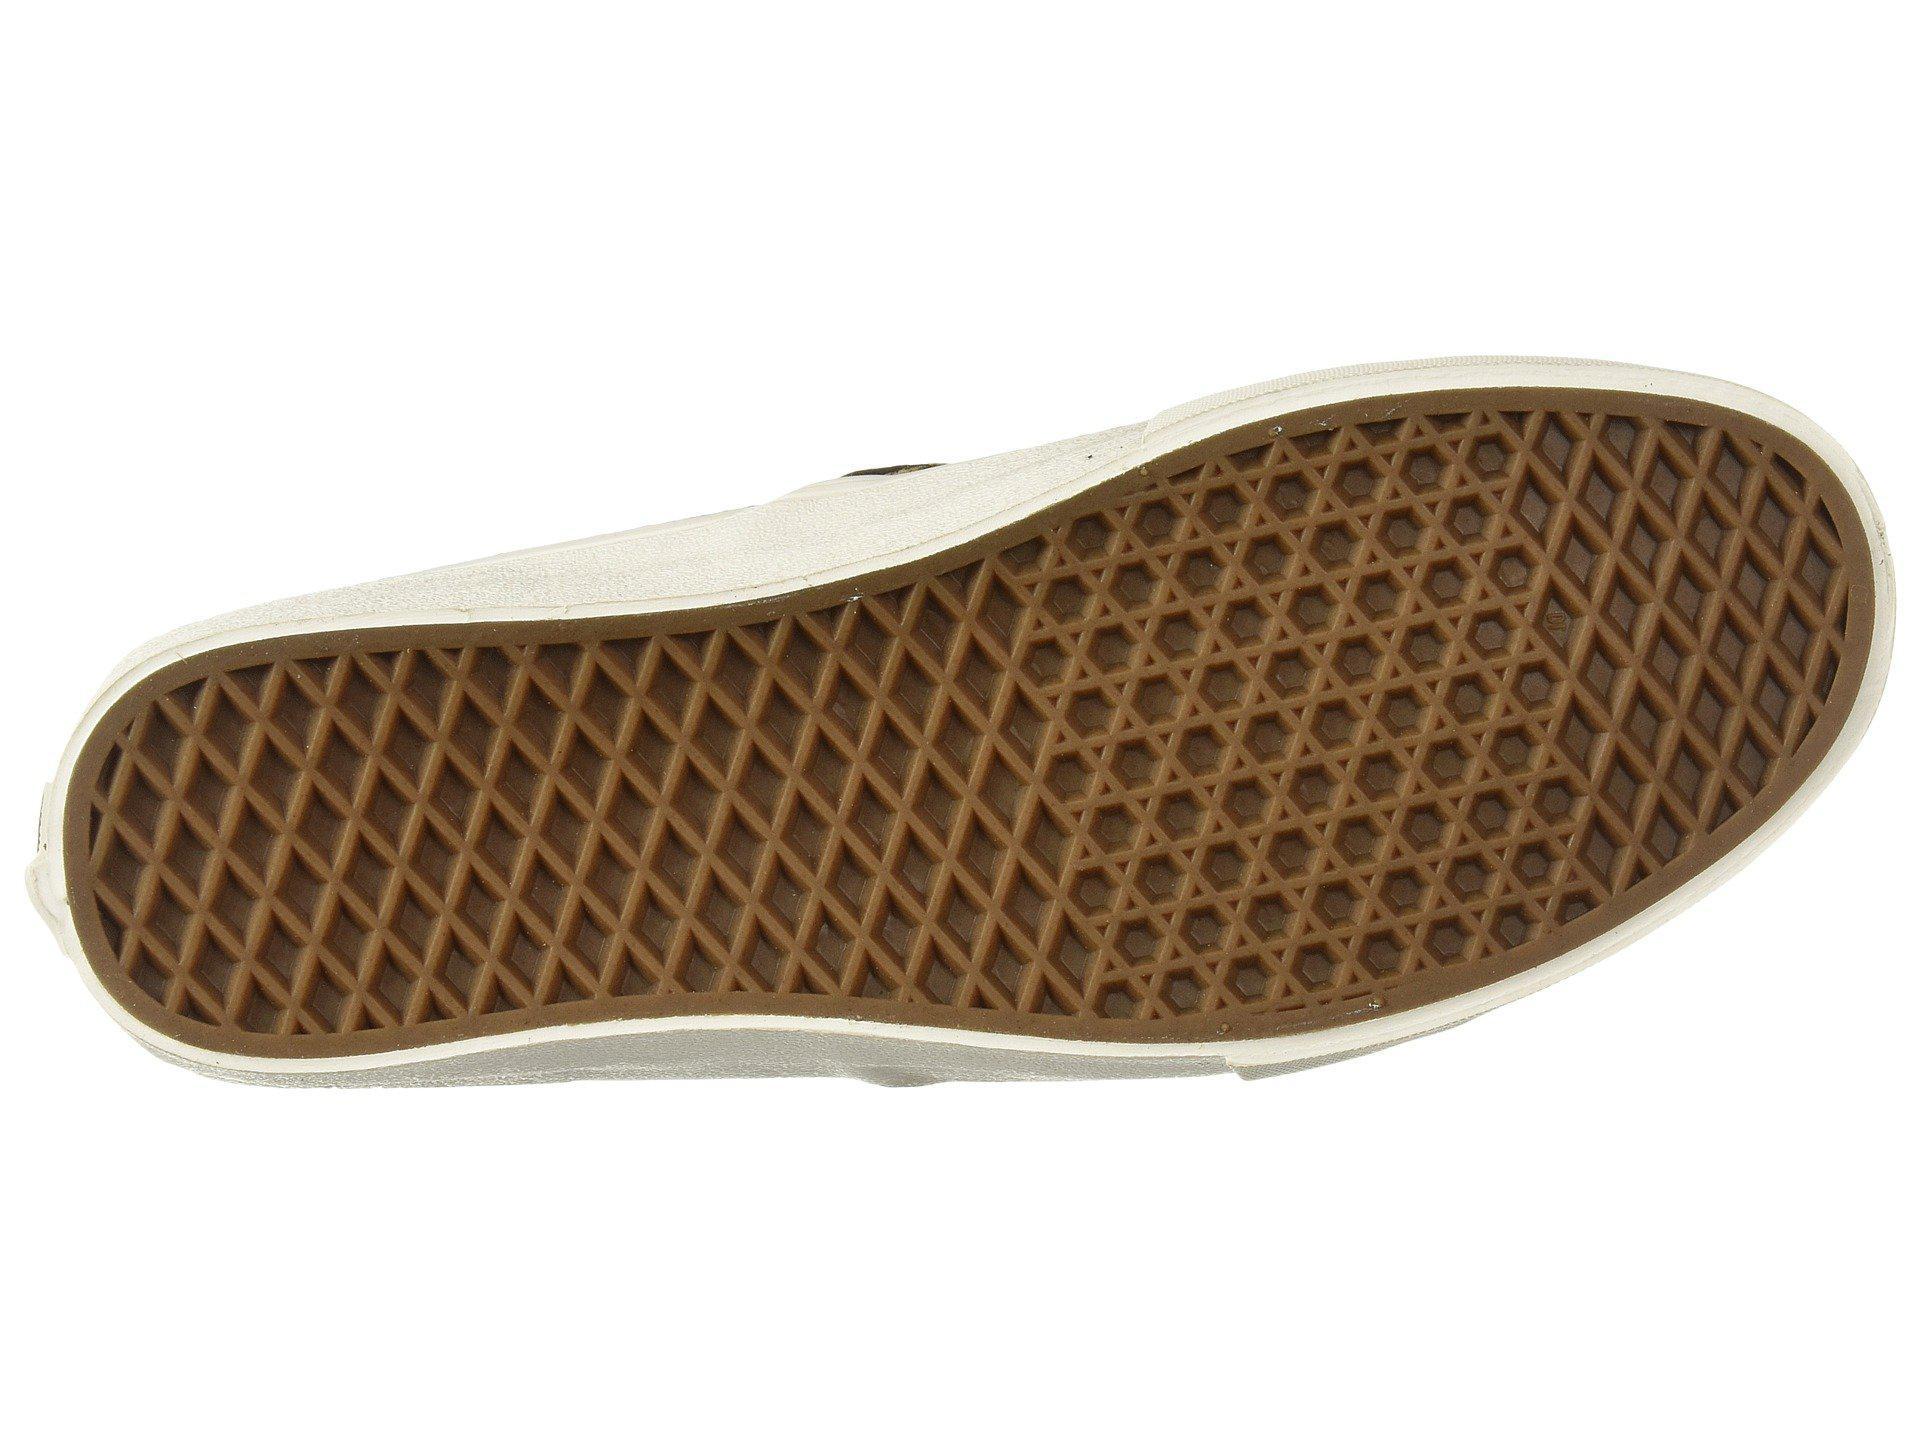 edc94fd07b Lyst - Vans Slip-on Sf ((hemp) Leopard  18) Skate Shoes